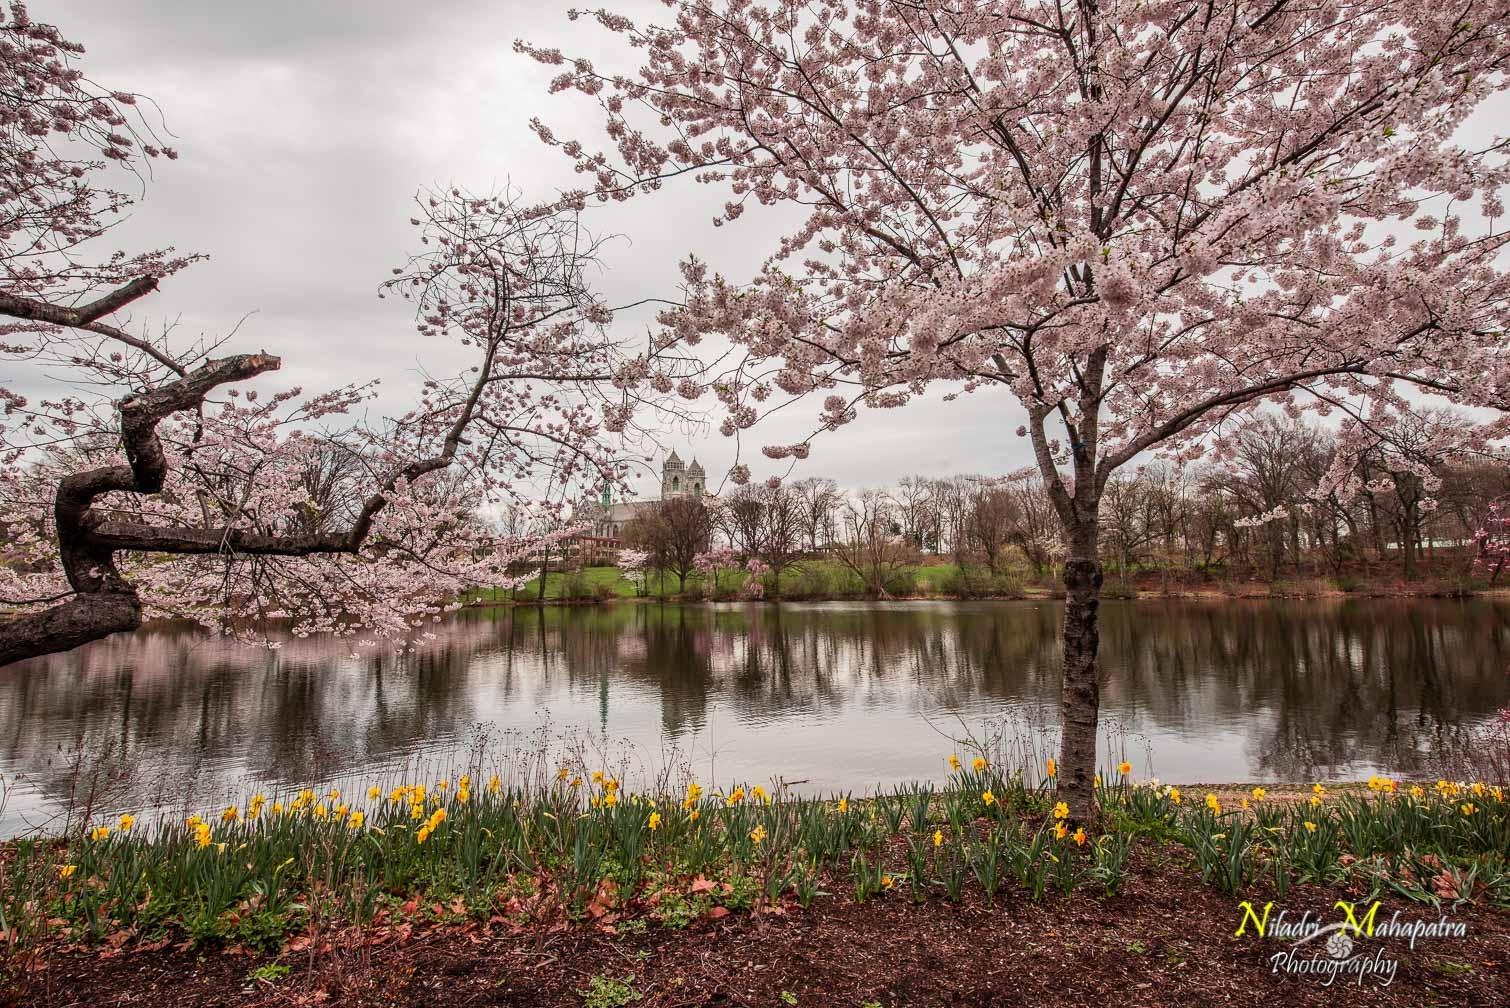 Spring BranchBrook Park NJ by Niladri Mahapatra